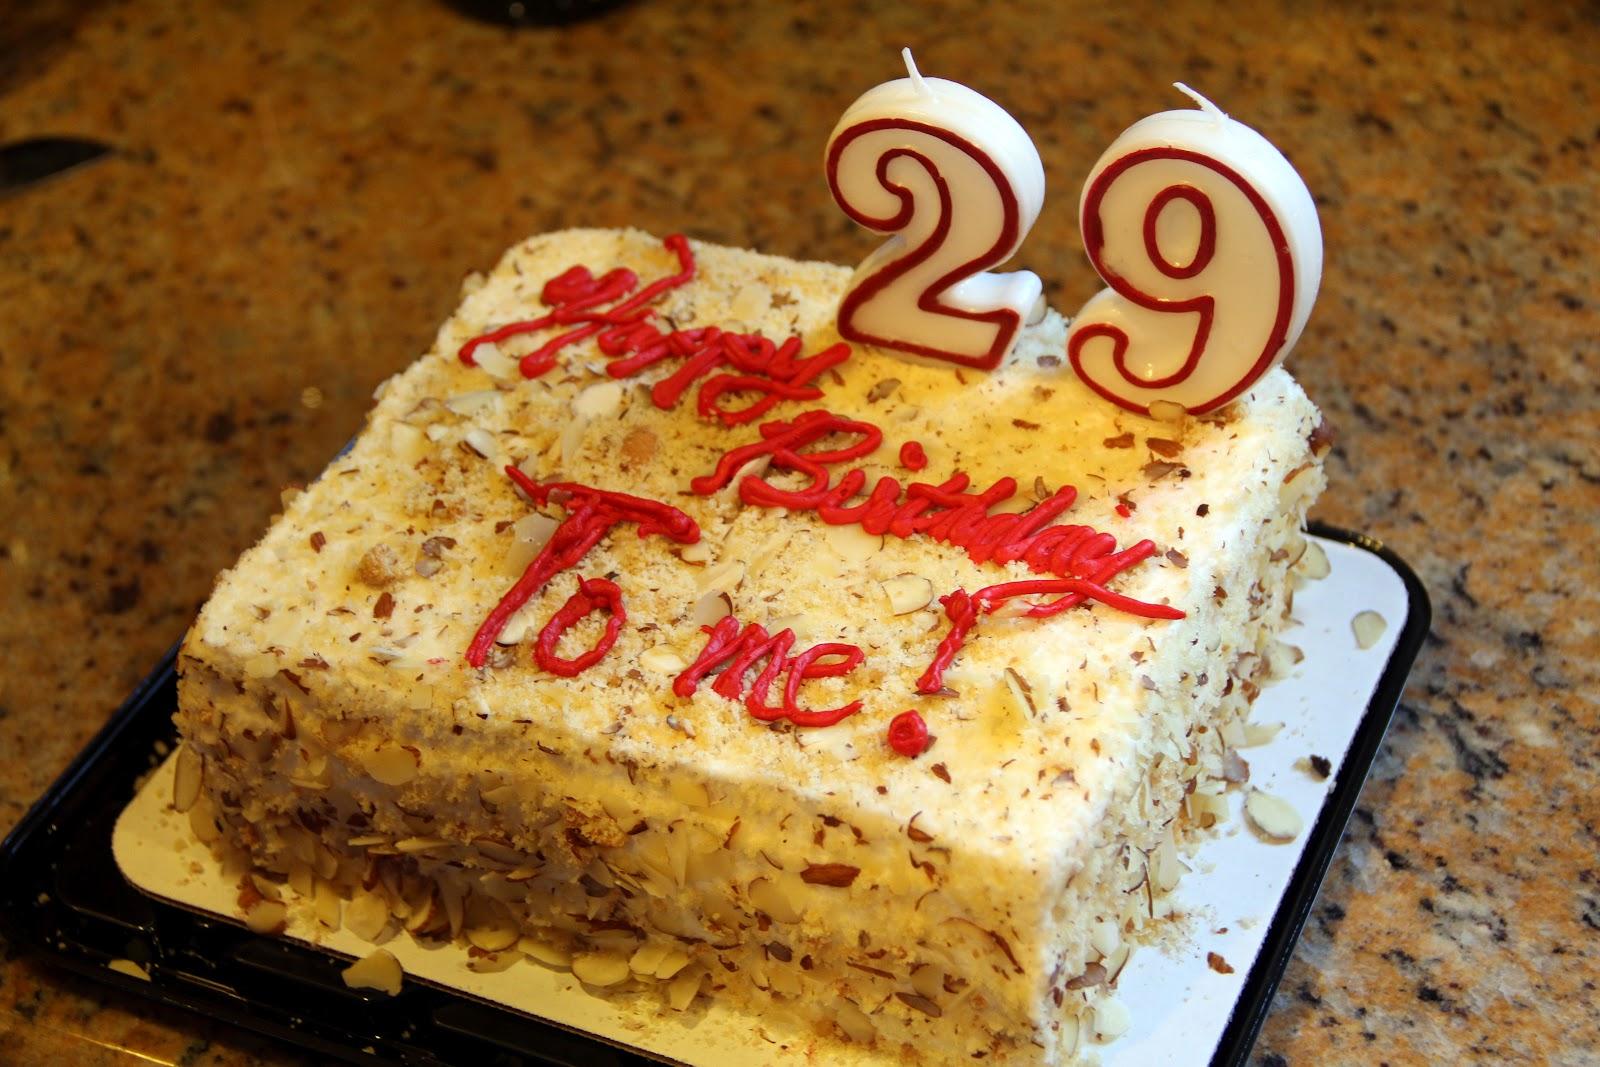 HAPPY BIRTHDAY BABY BROTHER CAKE